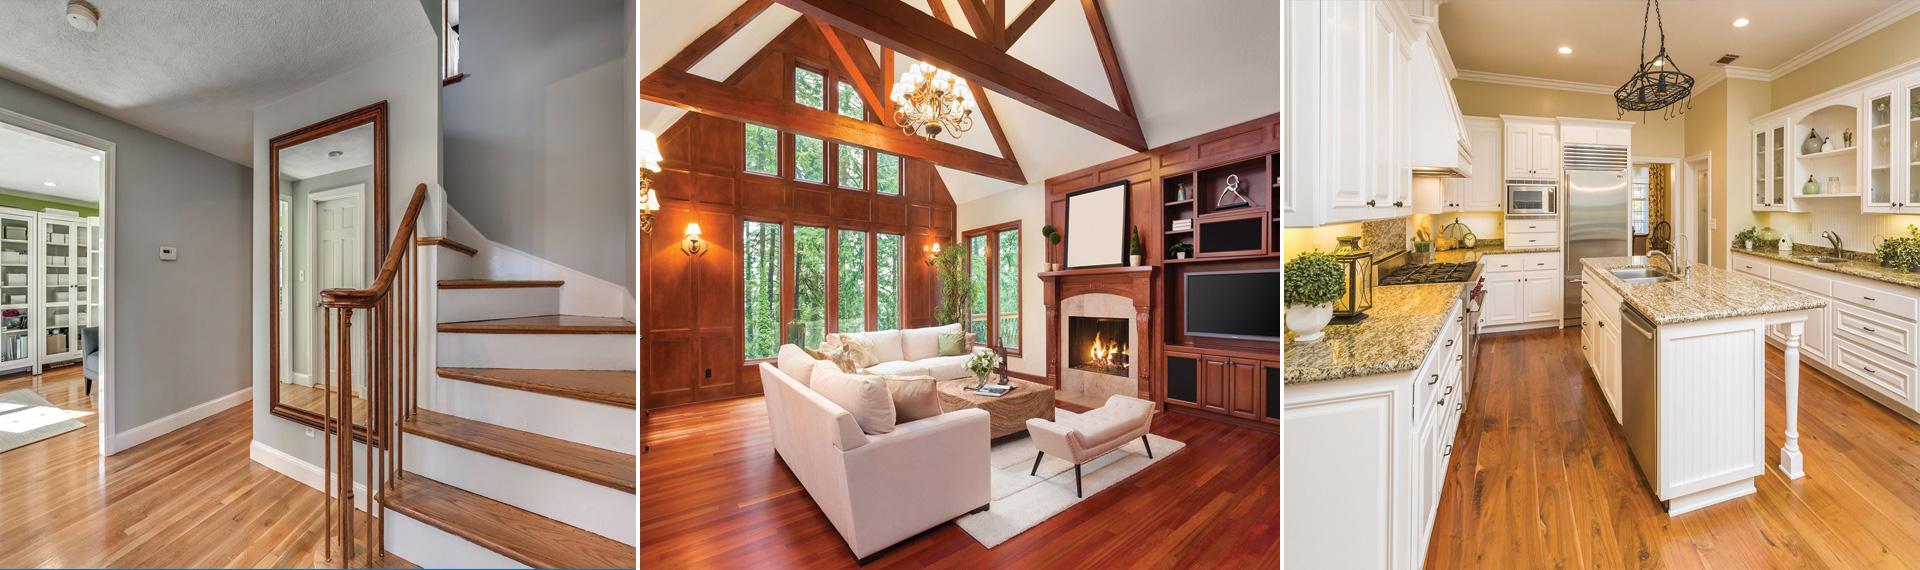 Renew Flooring & Home Improvement LLC Shaker Heights OH